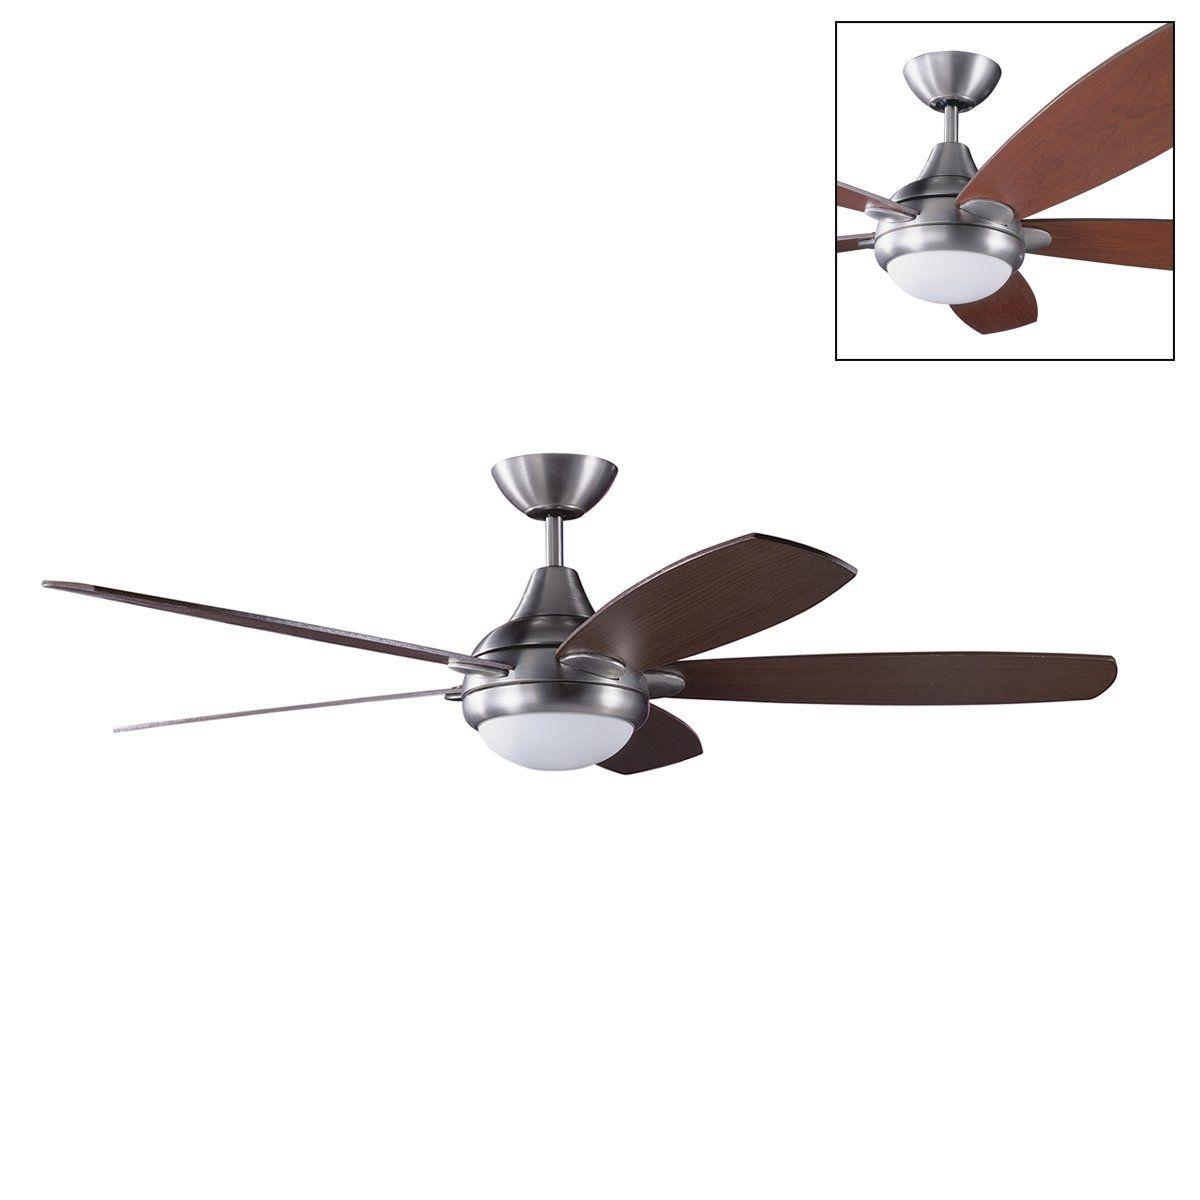 Kendal Lighting Ac14652 52 In Espirit Ceiling Fan Lowe S Canada